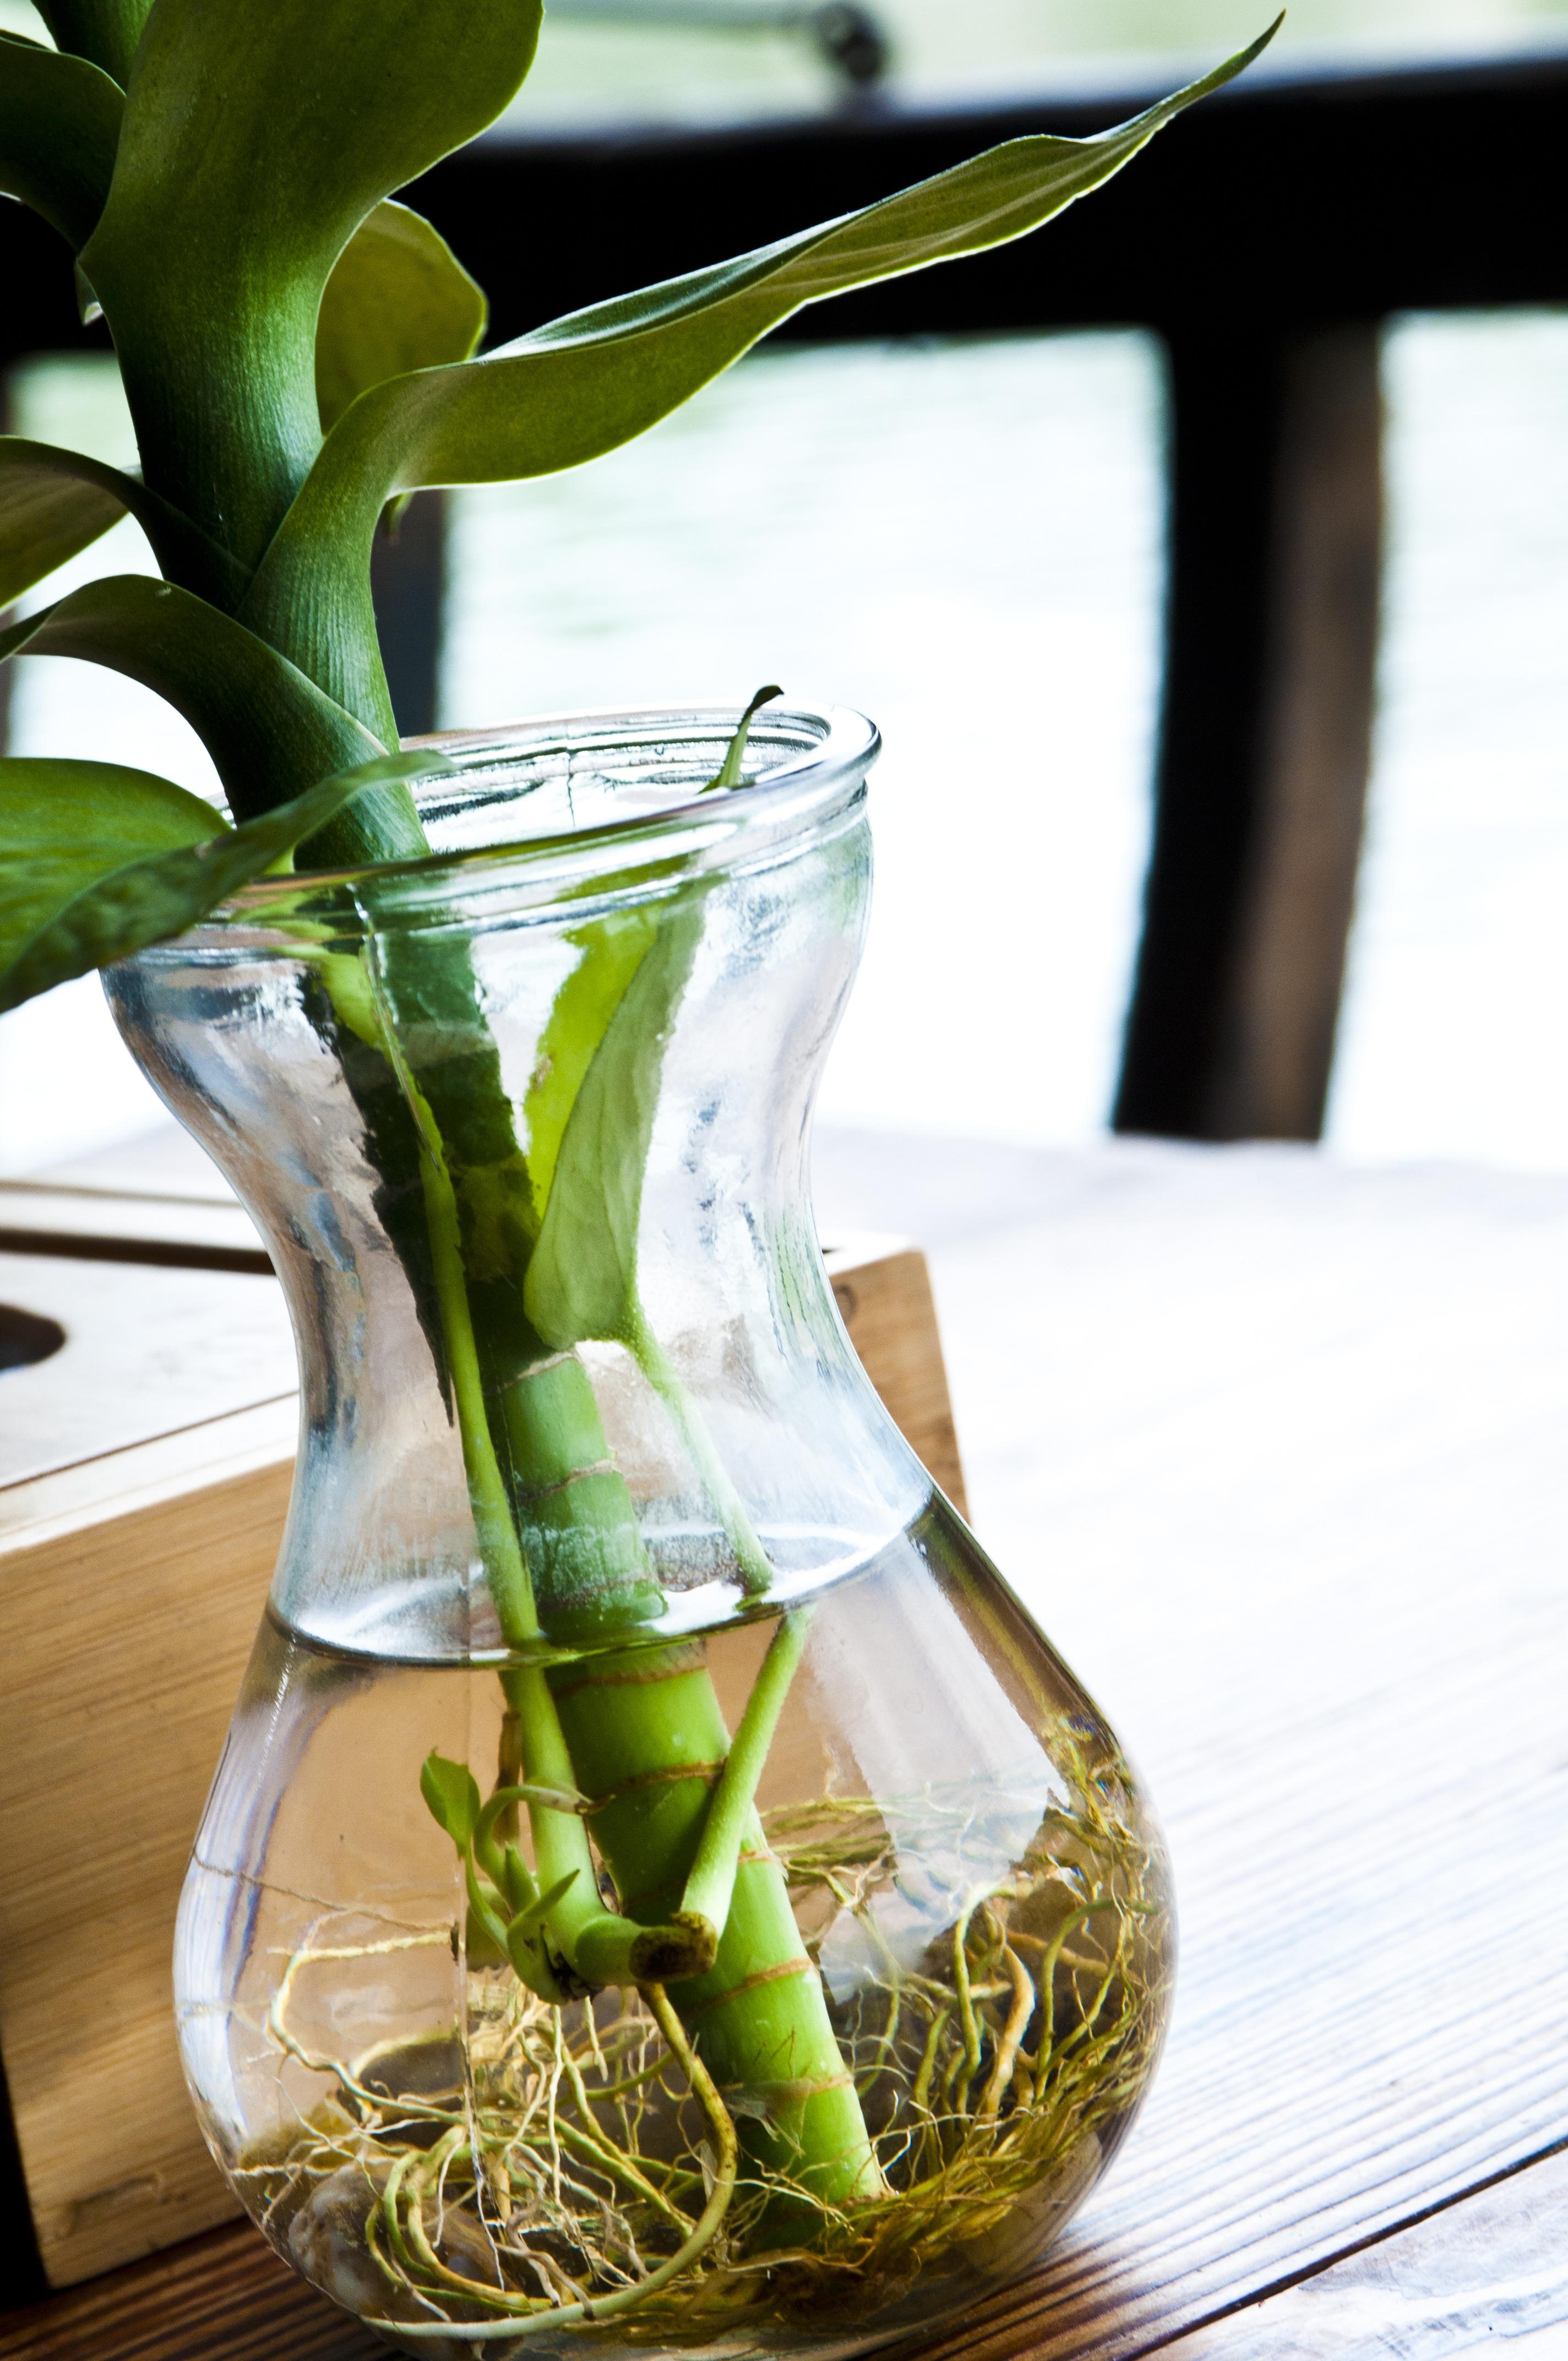 Gambar Pertumbuhan Menanam Bunga Makanan Menghasilkan Alam Minum Akar Kayu Botol Air Tabel Budidaya Bunga Shimizu Daya Hidup Daun Hijau Tanaman Berbunga 2848x4288 522578 Galeri Foto Pxhere